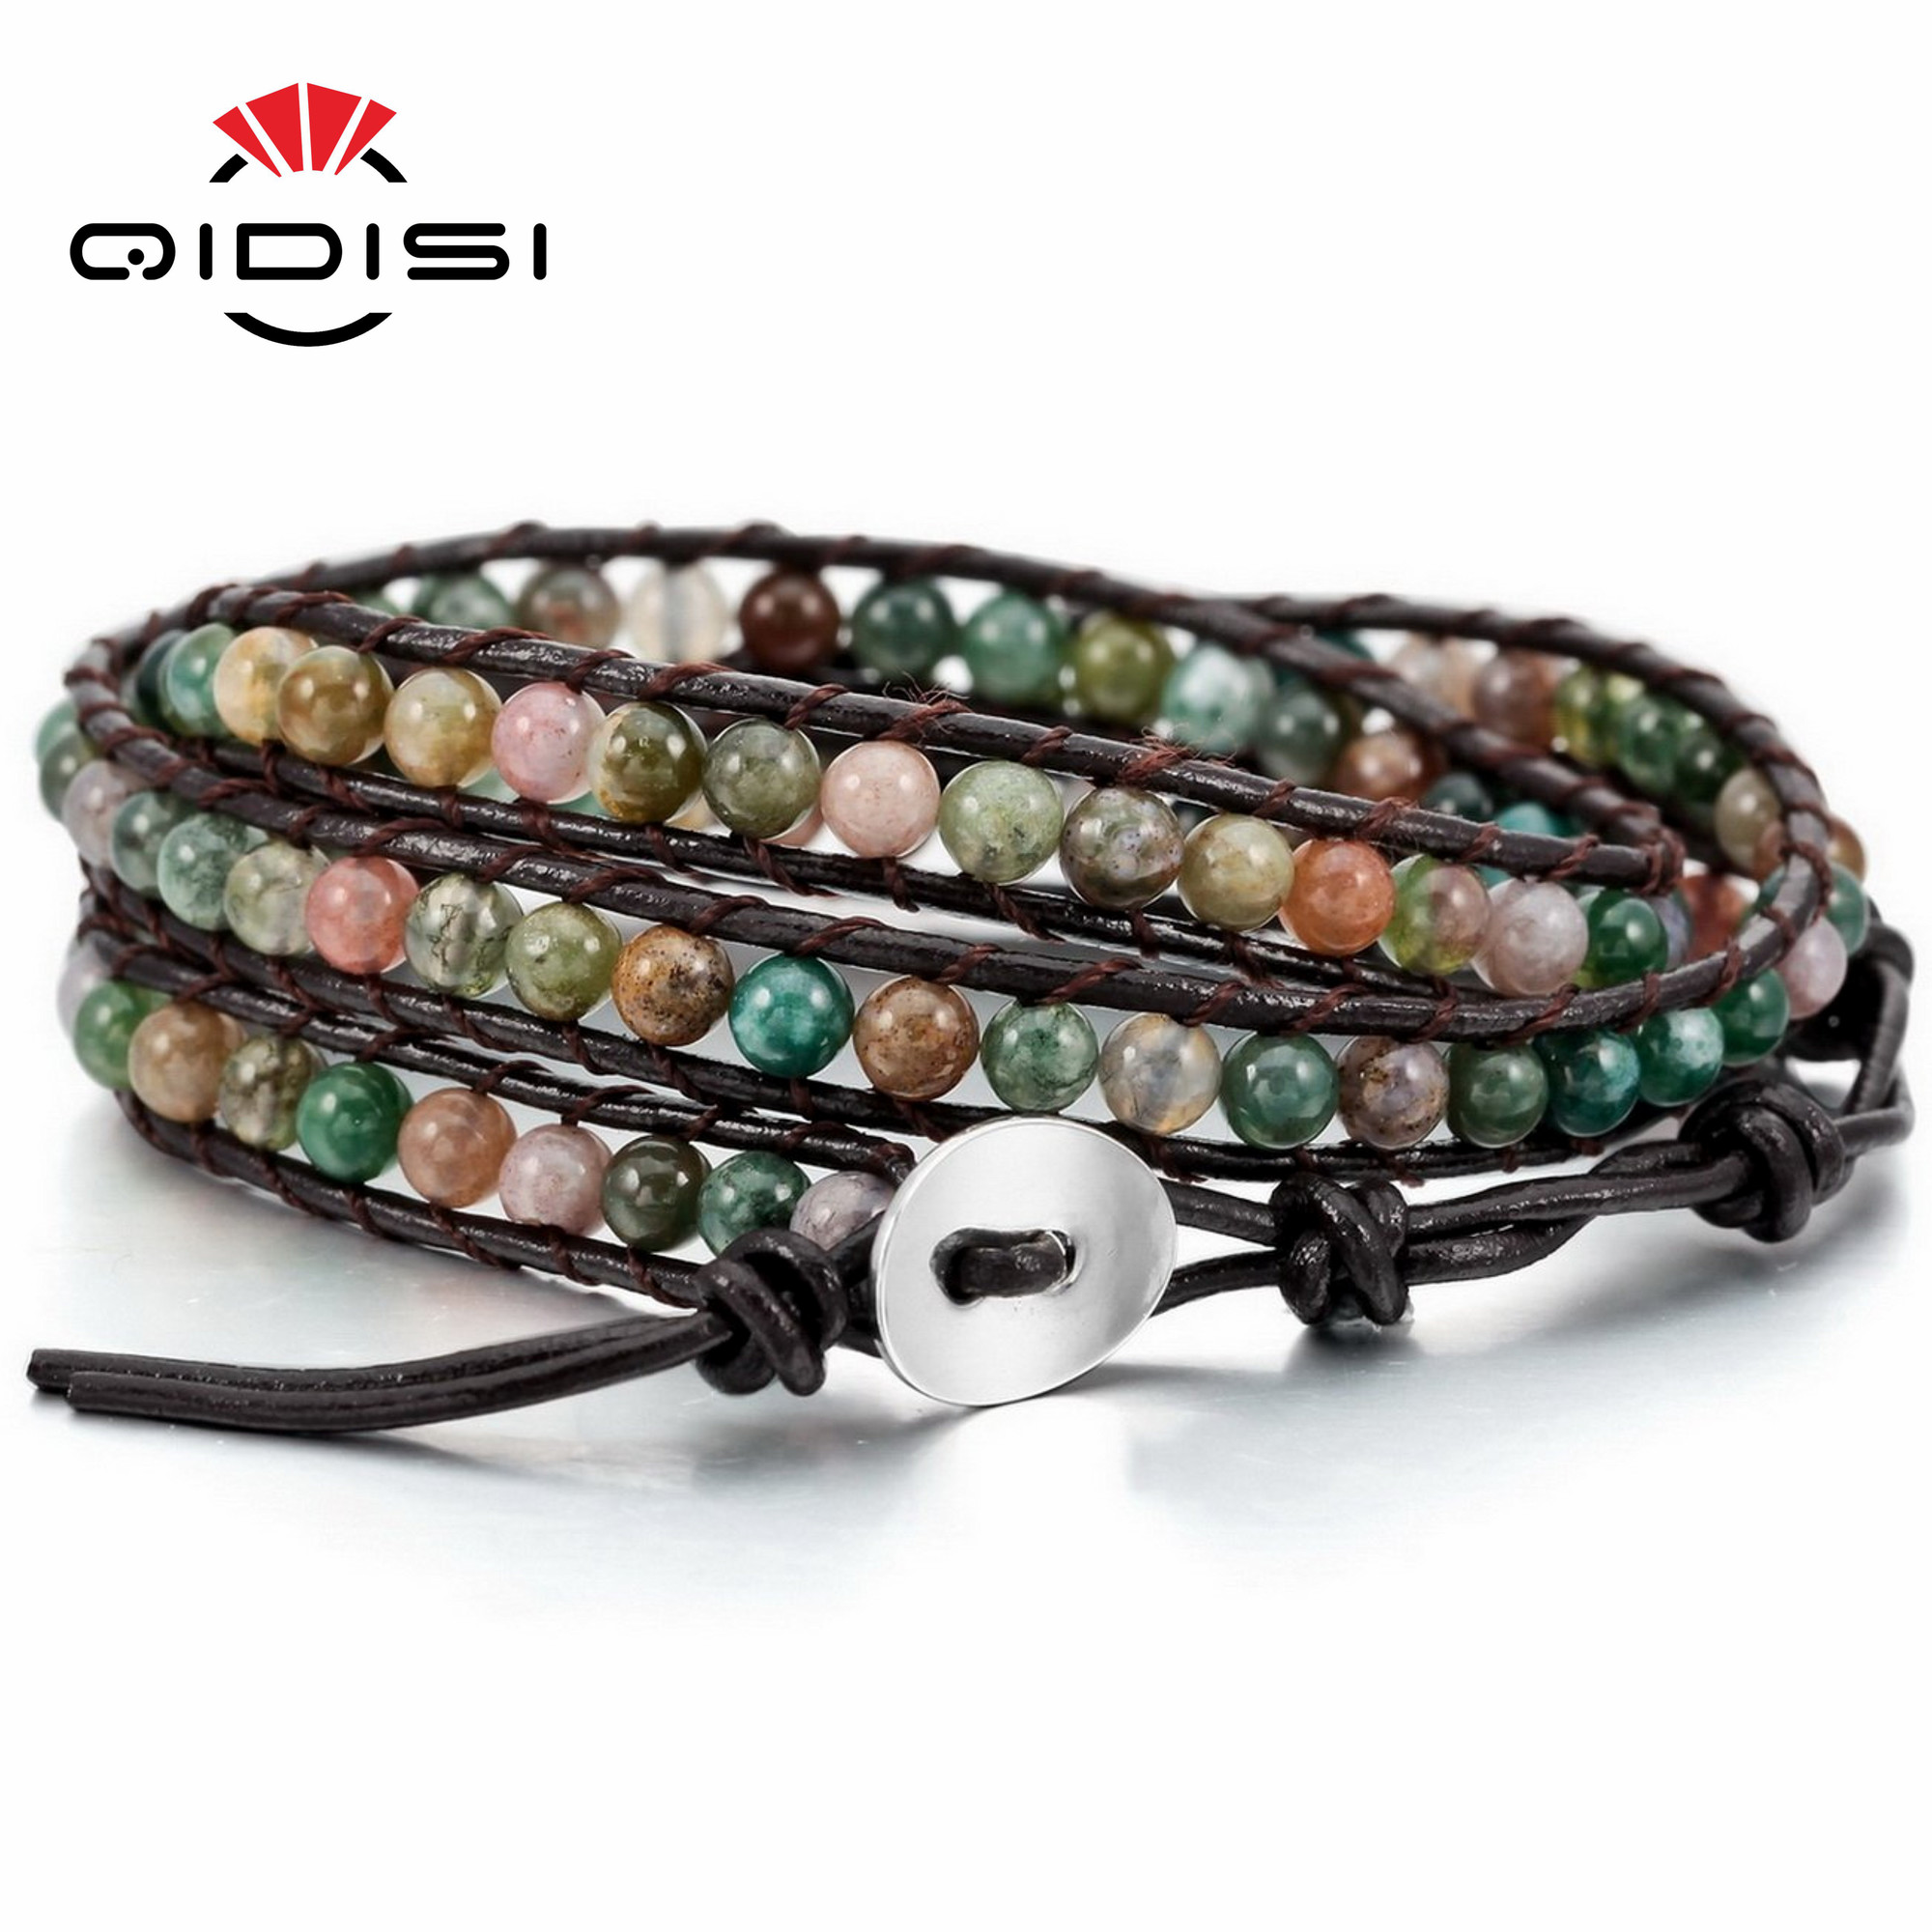 Stone Beads Alloy Genuine Leather Bracelet Men Women Bangle Cuff Rope Bead 3 Wrap Adjustable glitter stone open cuff bangle